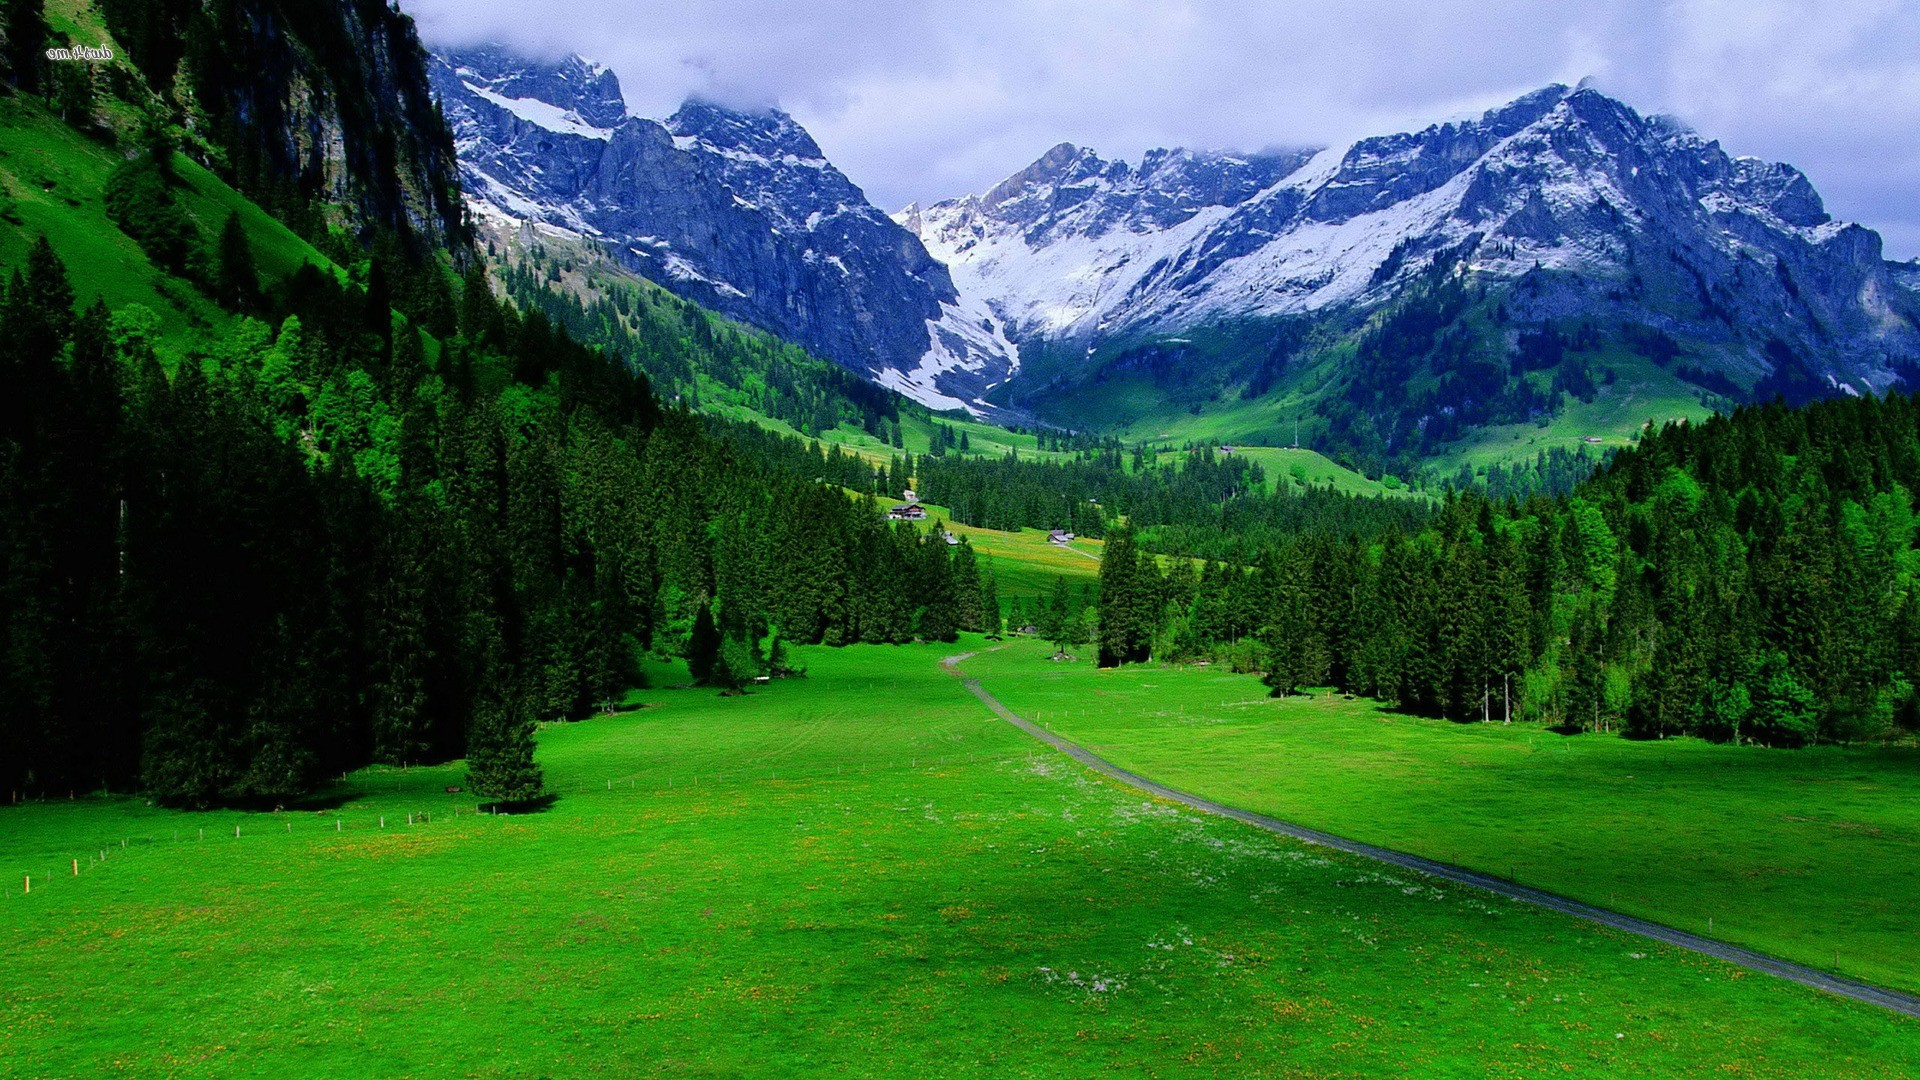 Nature Scenes Fotolip Com Rich Image And Wallpaper